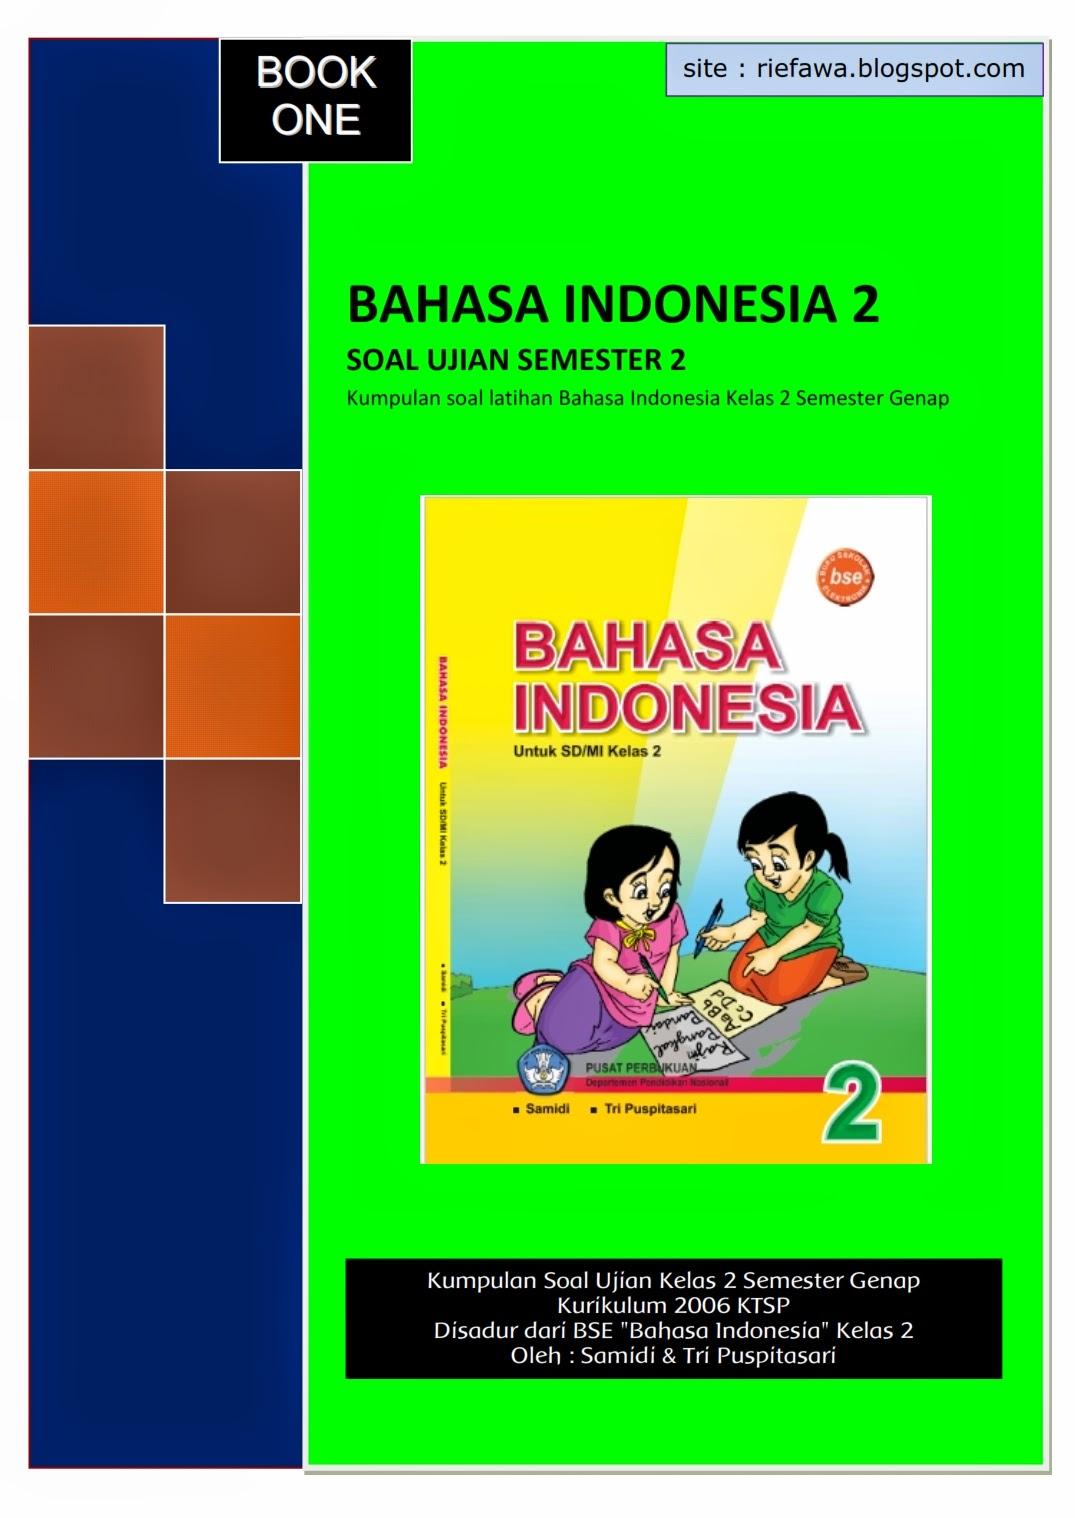 Download Kumpulan Soal Bahasa Indonesia Kelas 2 Semester Genap Book 1 Rief Awa Blog